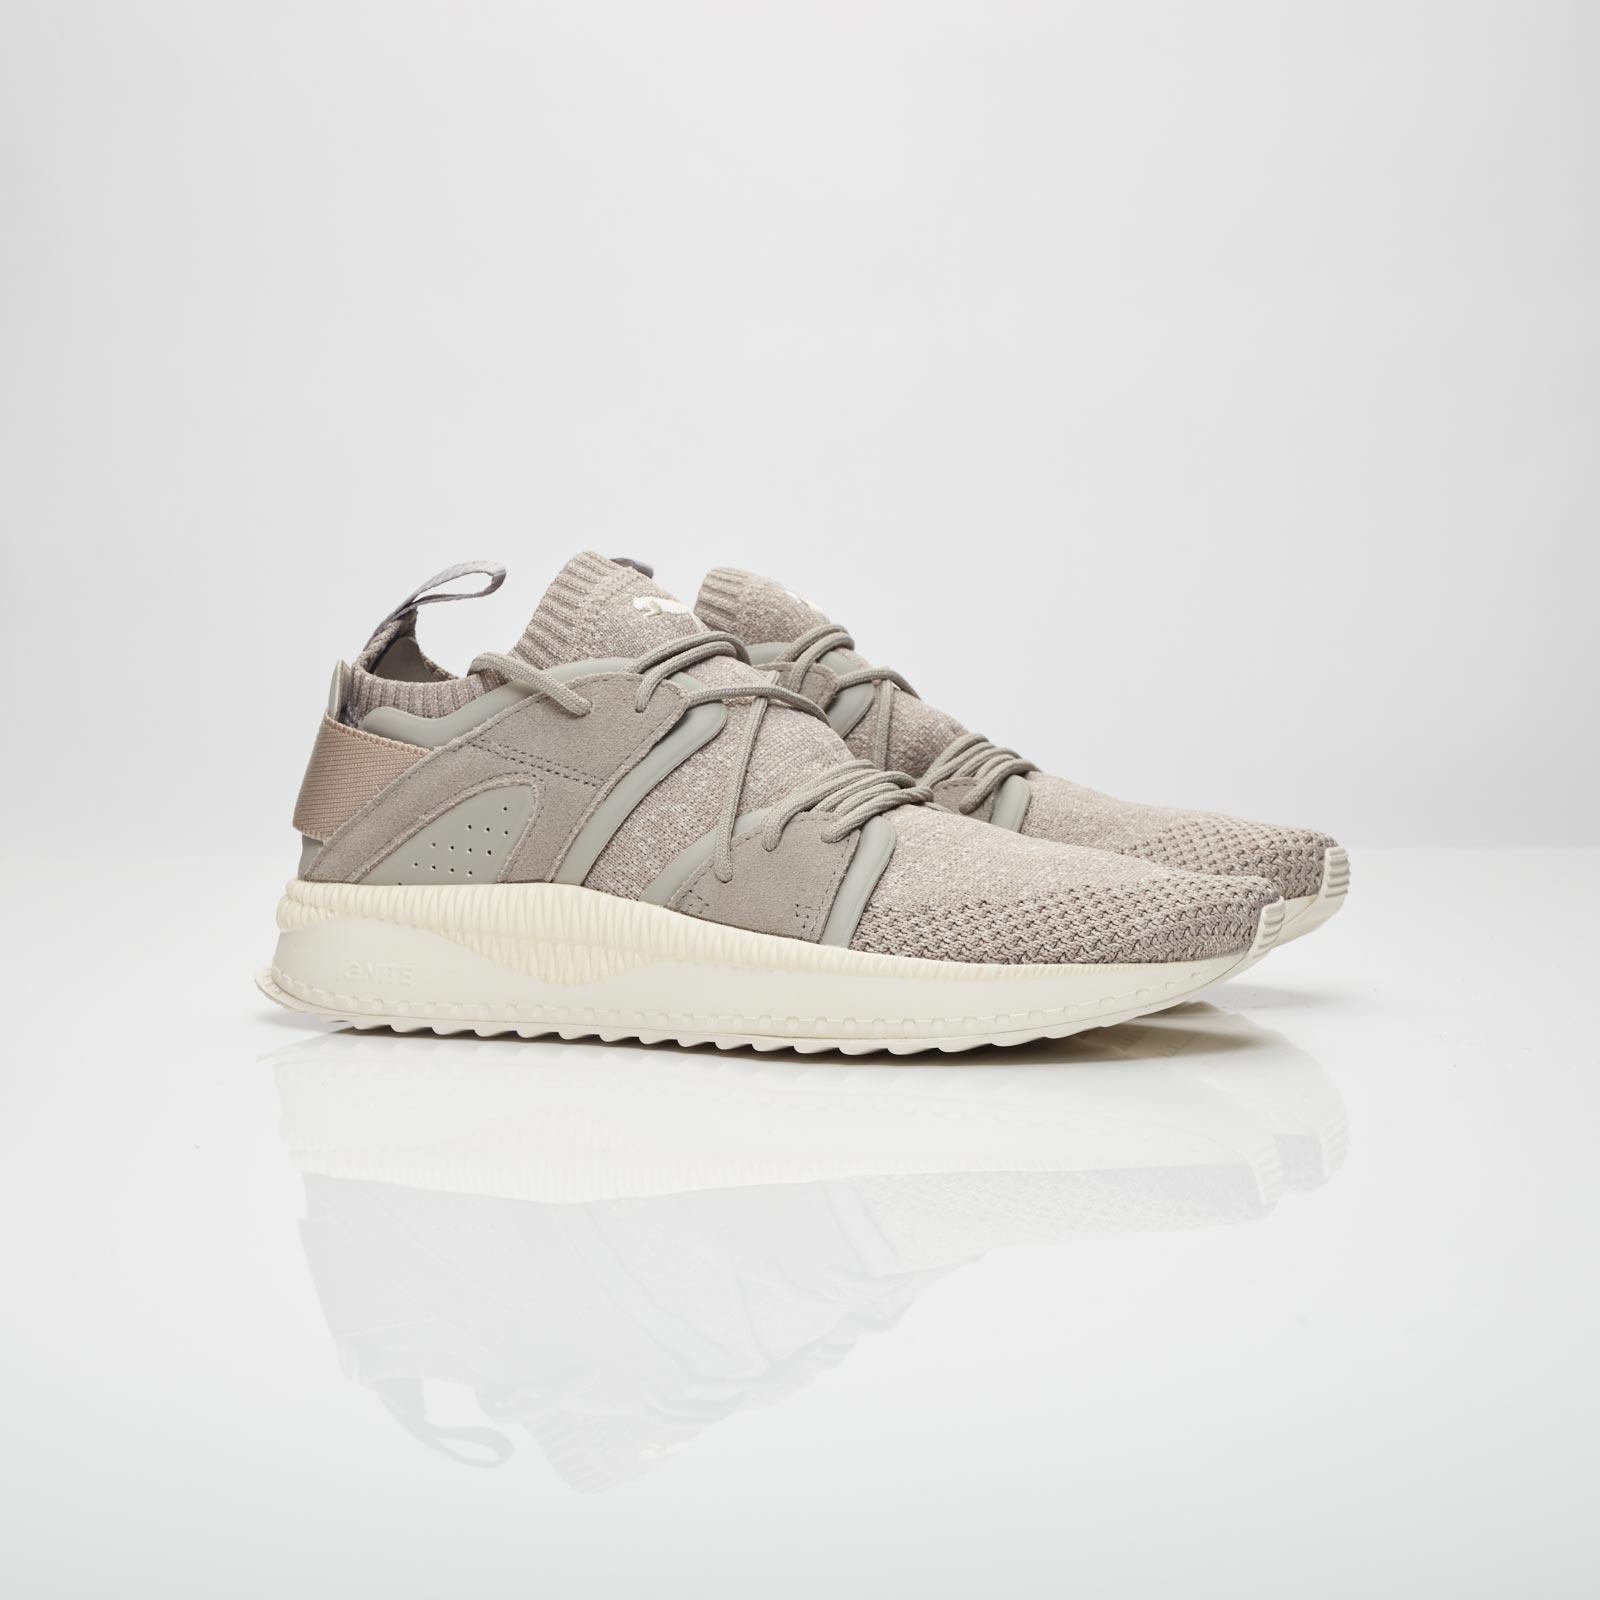 58c95b99b221e0 Puma Tsugi Blaze Evoknit - 364408-02 - Sneakersnstuff